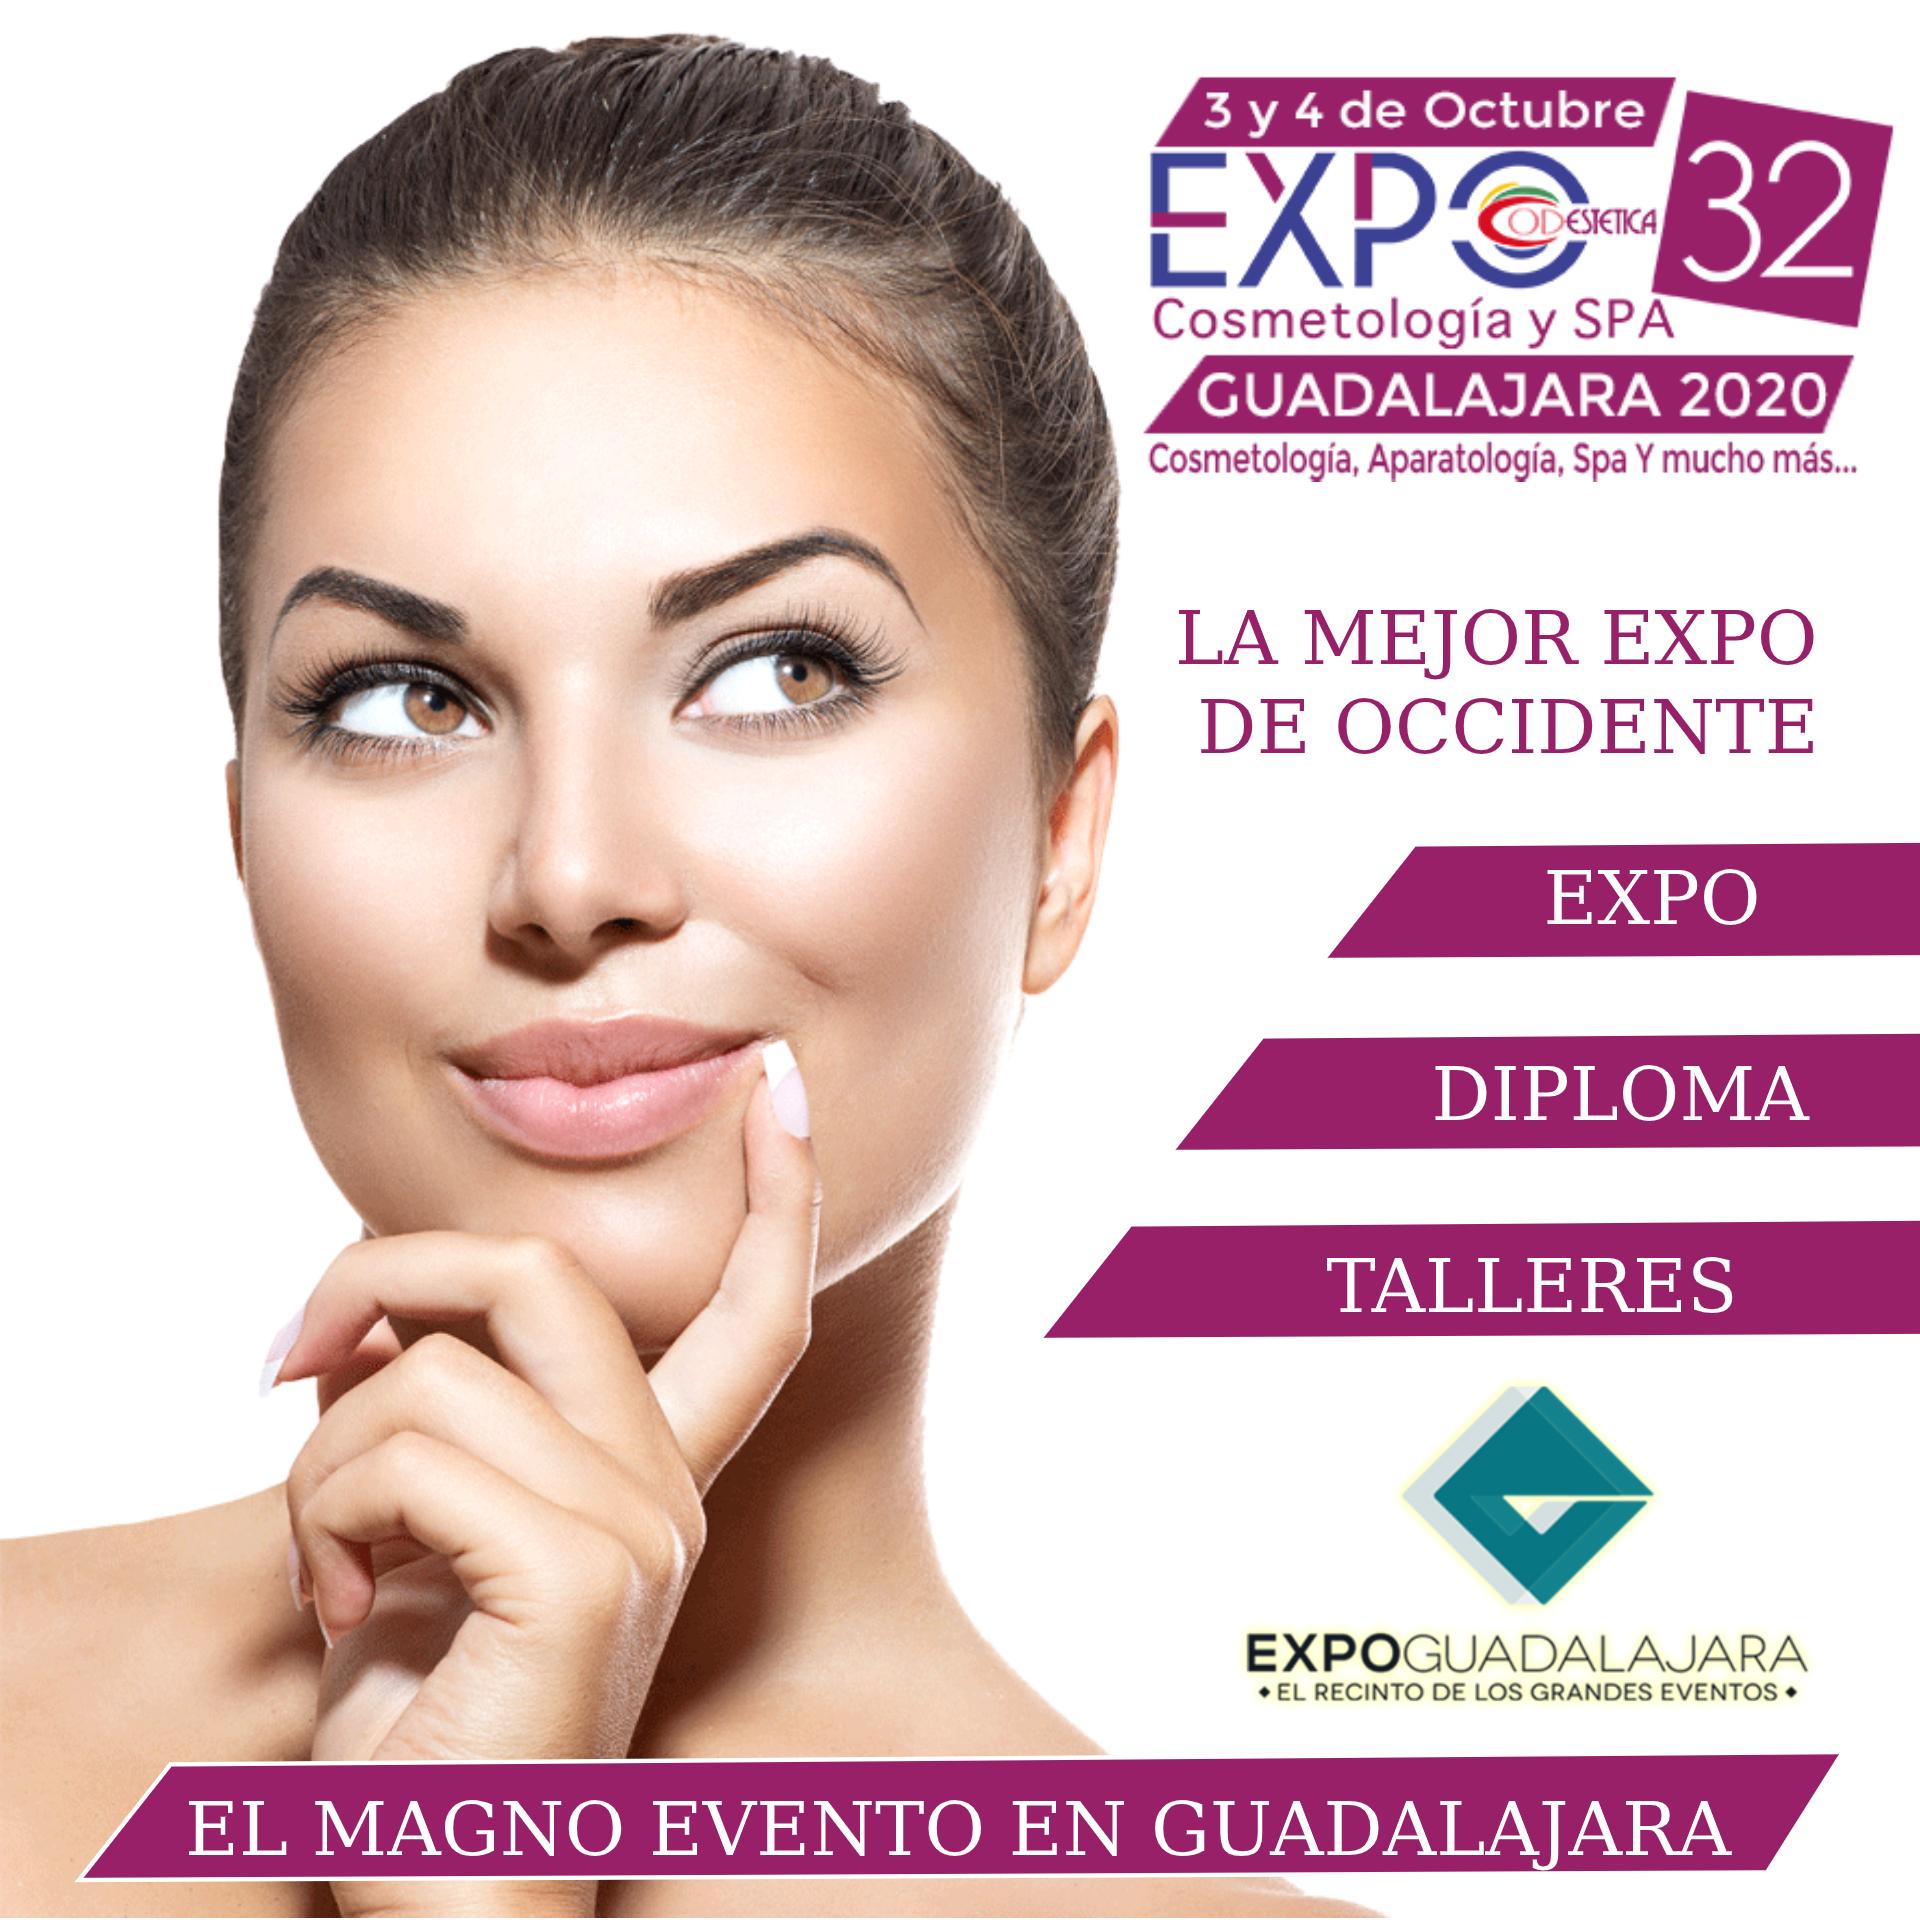 32 EXPO CODESTETICA GUADALAJARA 2020